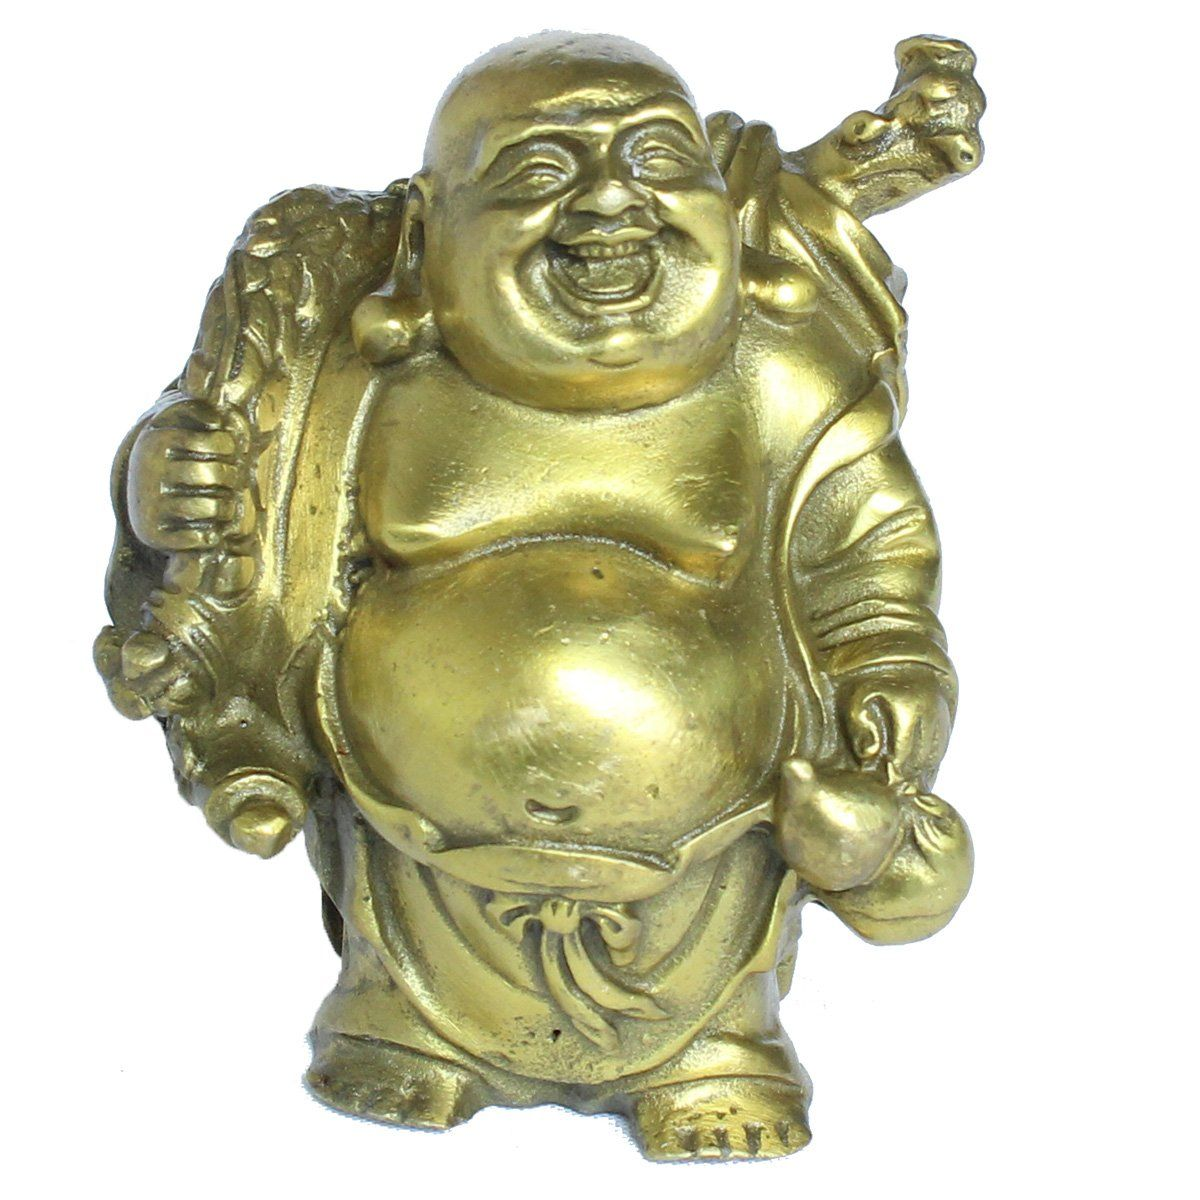 Happy mini lucky buddha fun unusual Christmas gift birthday gift idea